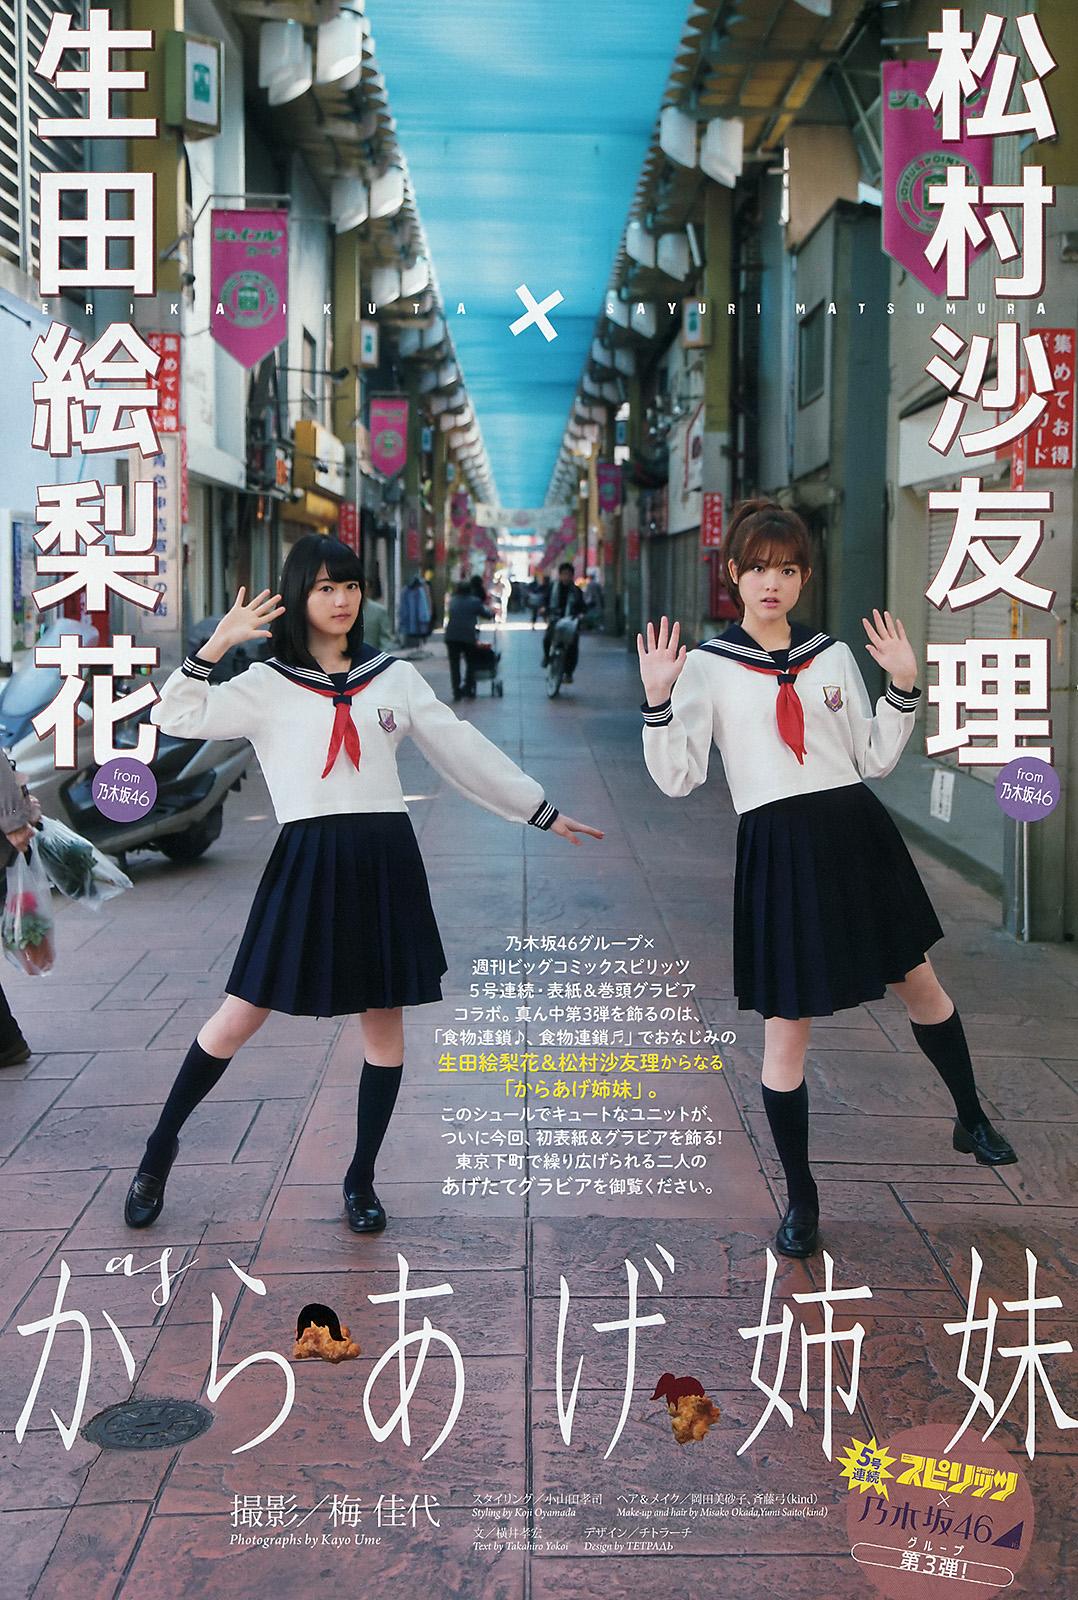 Ikuta Erika 生田絵梨花 x Matsumura Sayuri 松村沙友理 Big Comic Spirits 2016 No 3 Pics